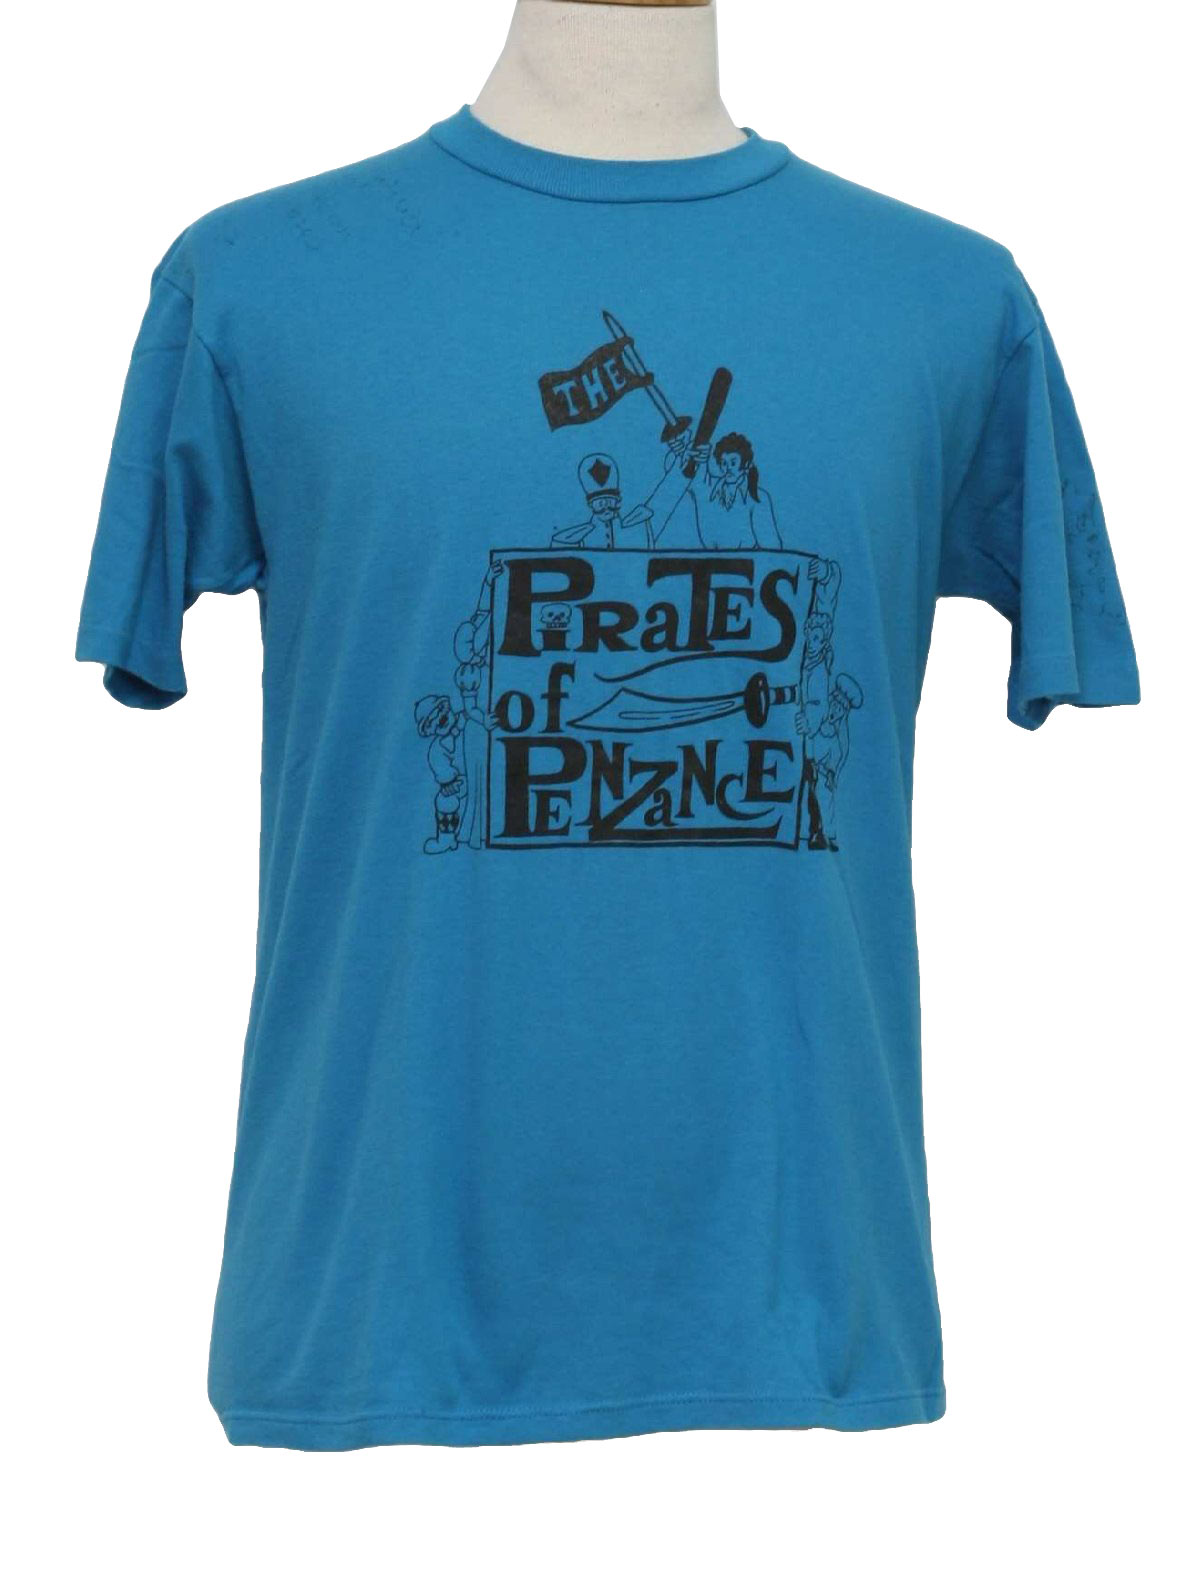 80s T Shirt Cutting Designs Joy Studio Design Gallery